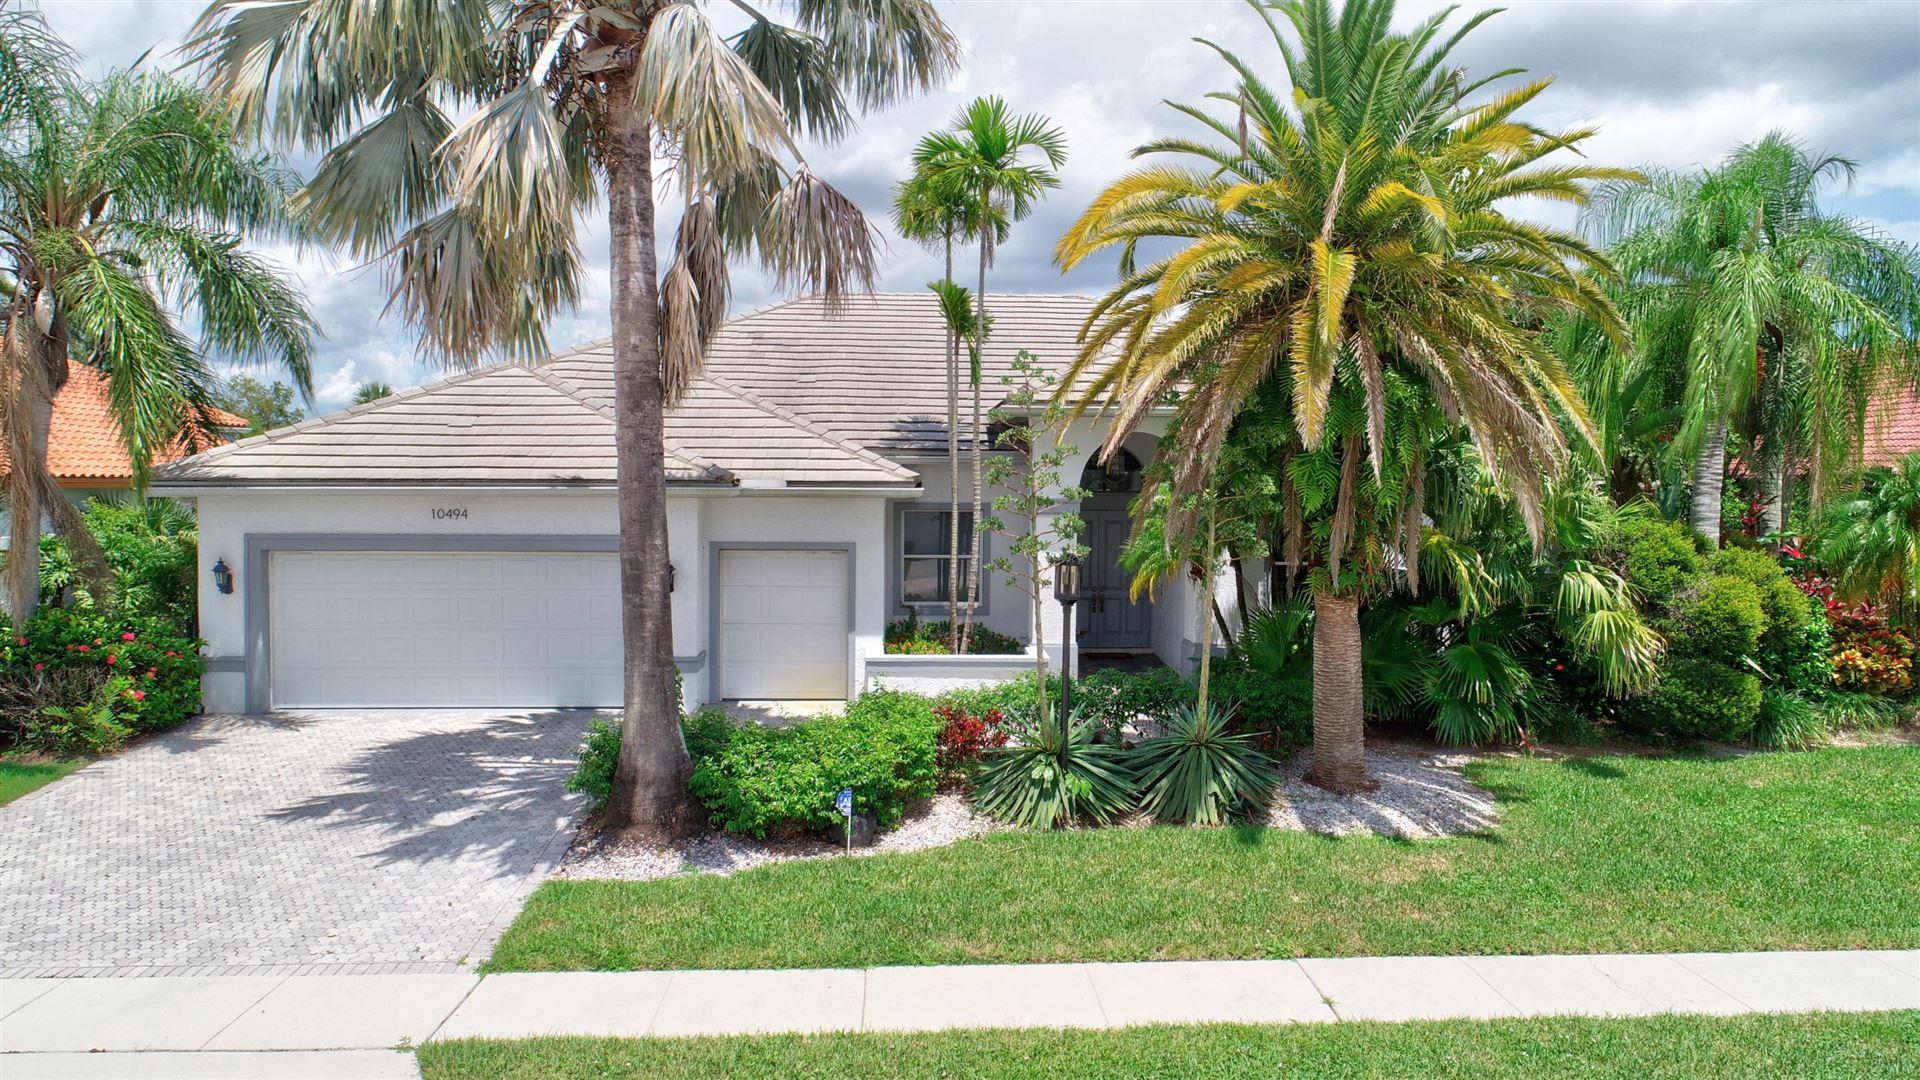 10494 Stonebridge Boulevard, Boca Raton, FL 33498 - #: RX-10664147